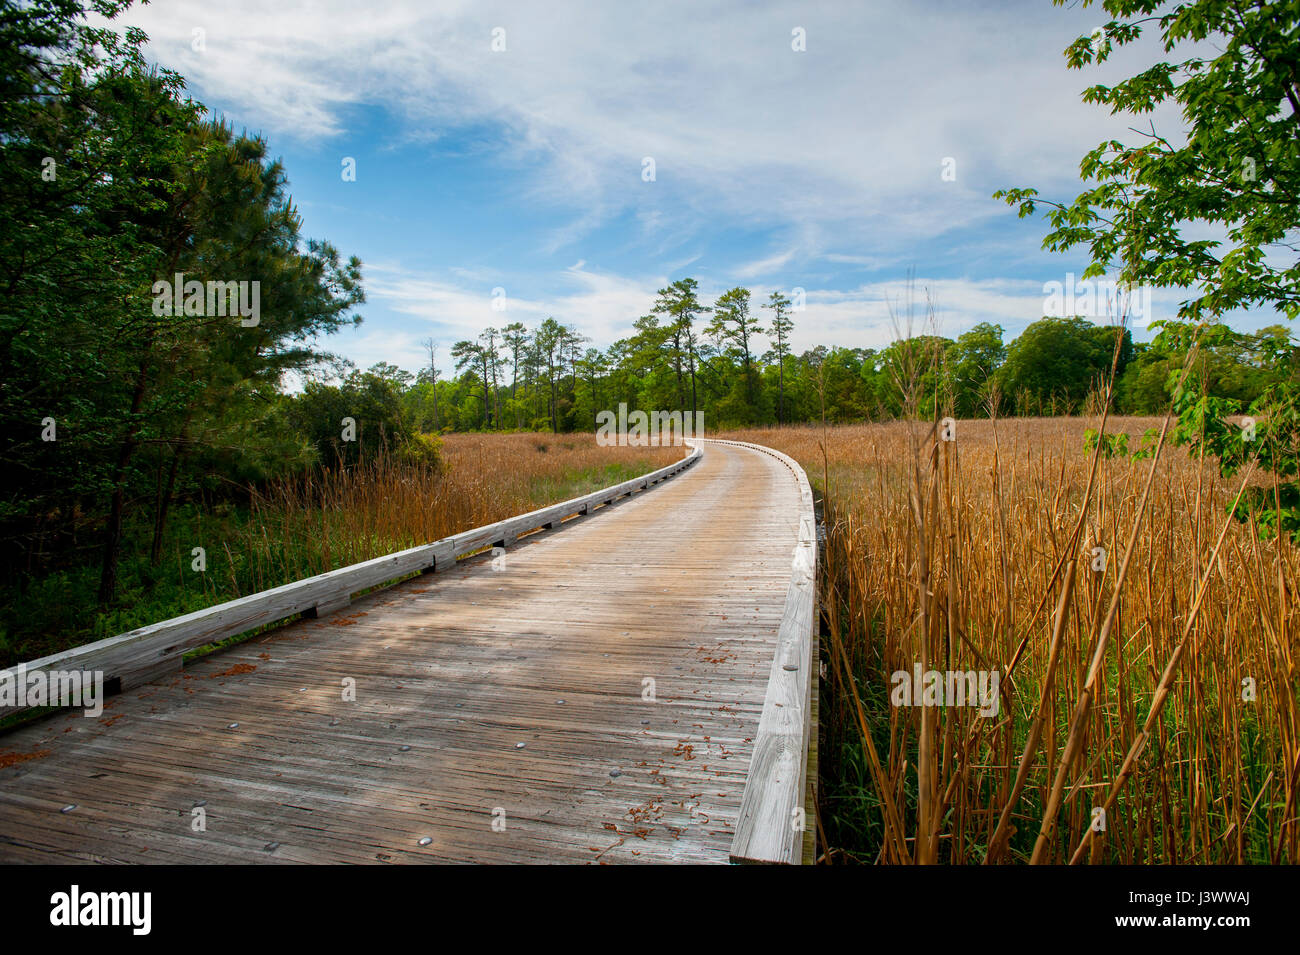 usa-virginia-va-single-lane-wooden-bridge-on-jamestown-island-along-J3WWAJ.jpg